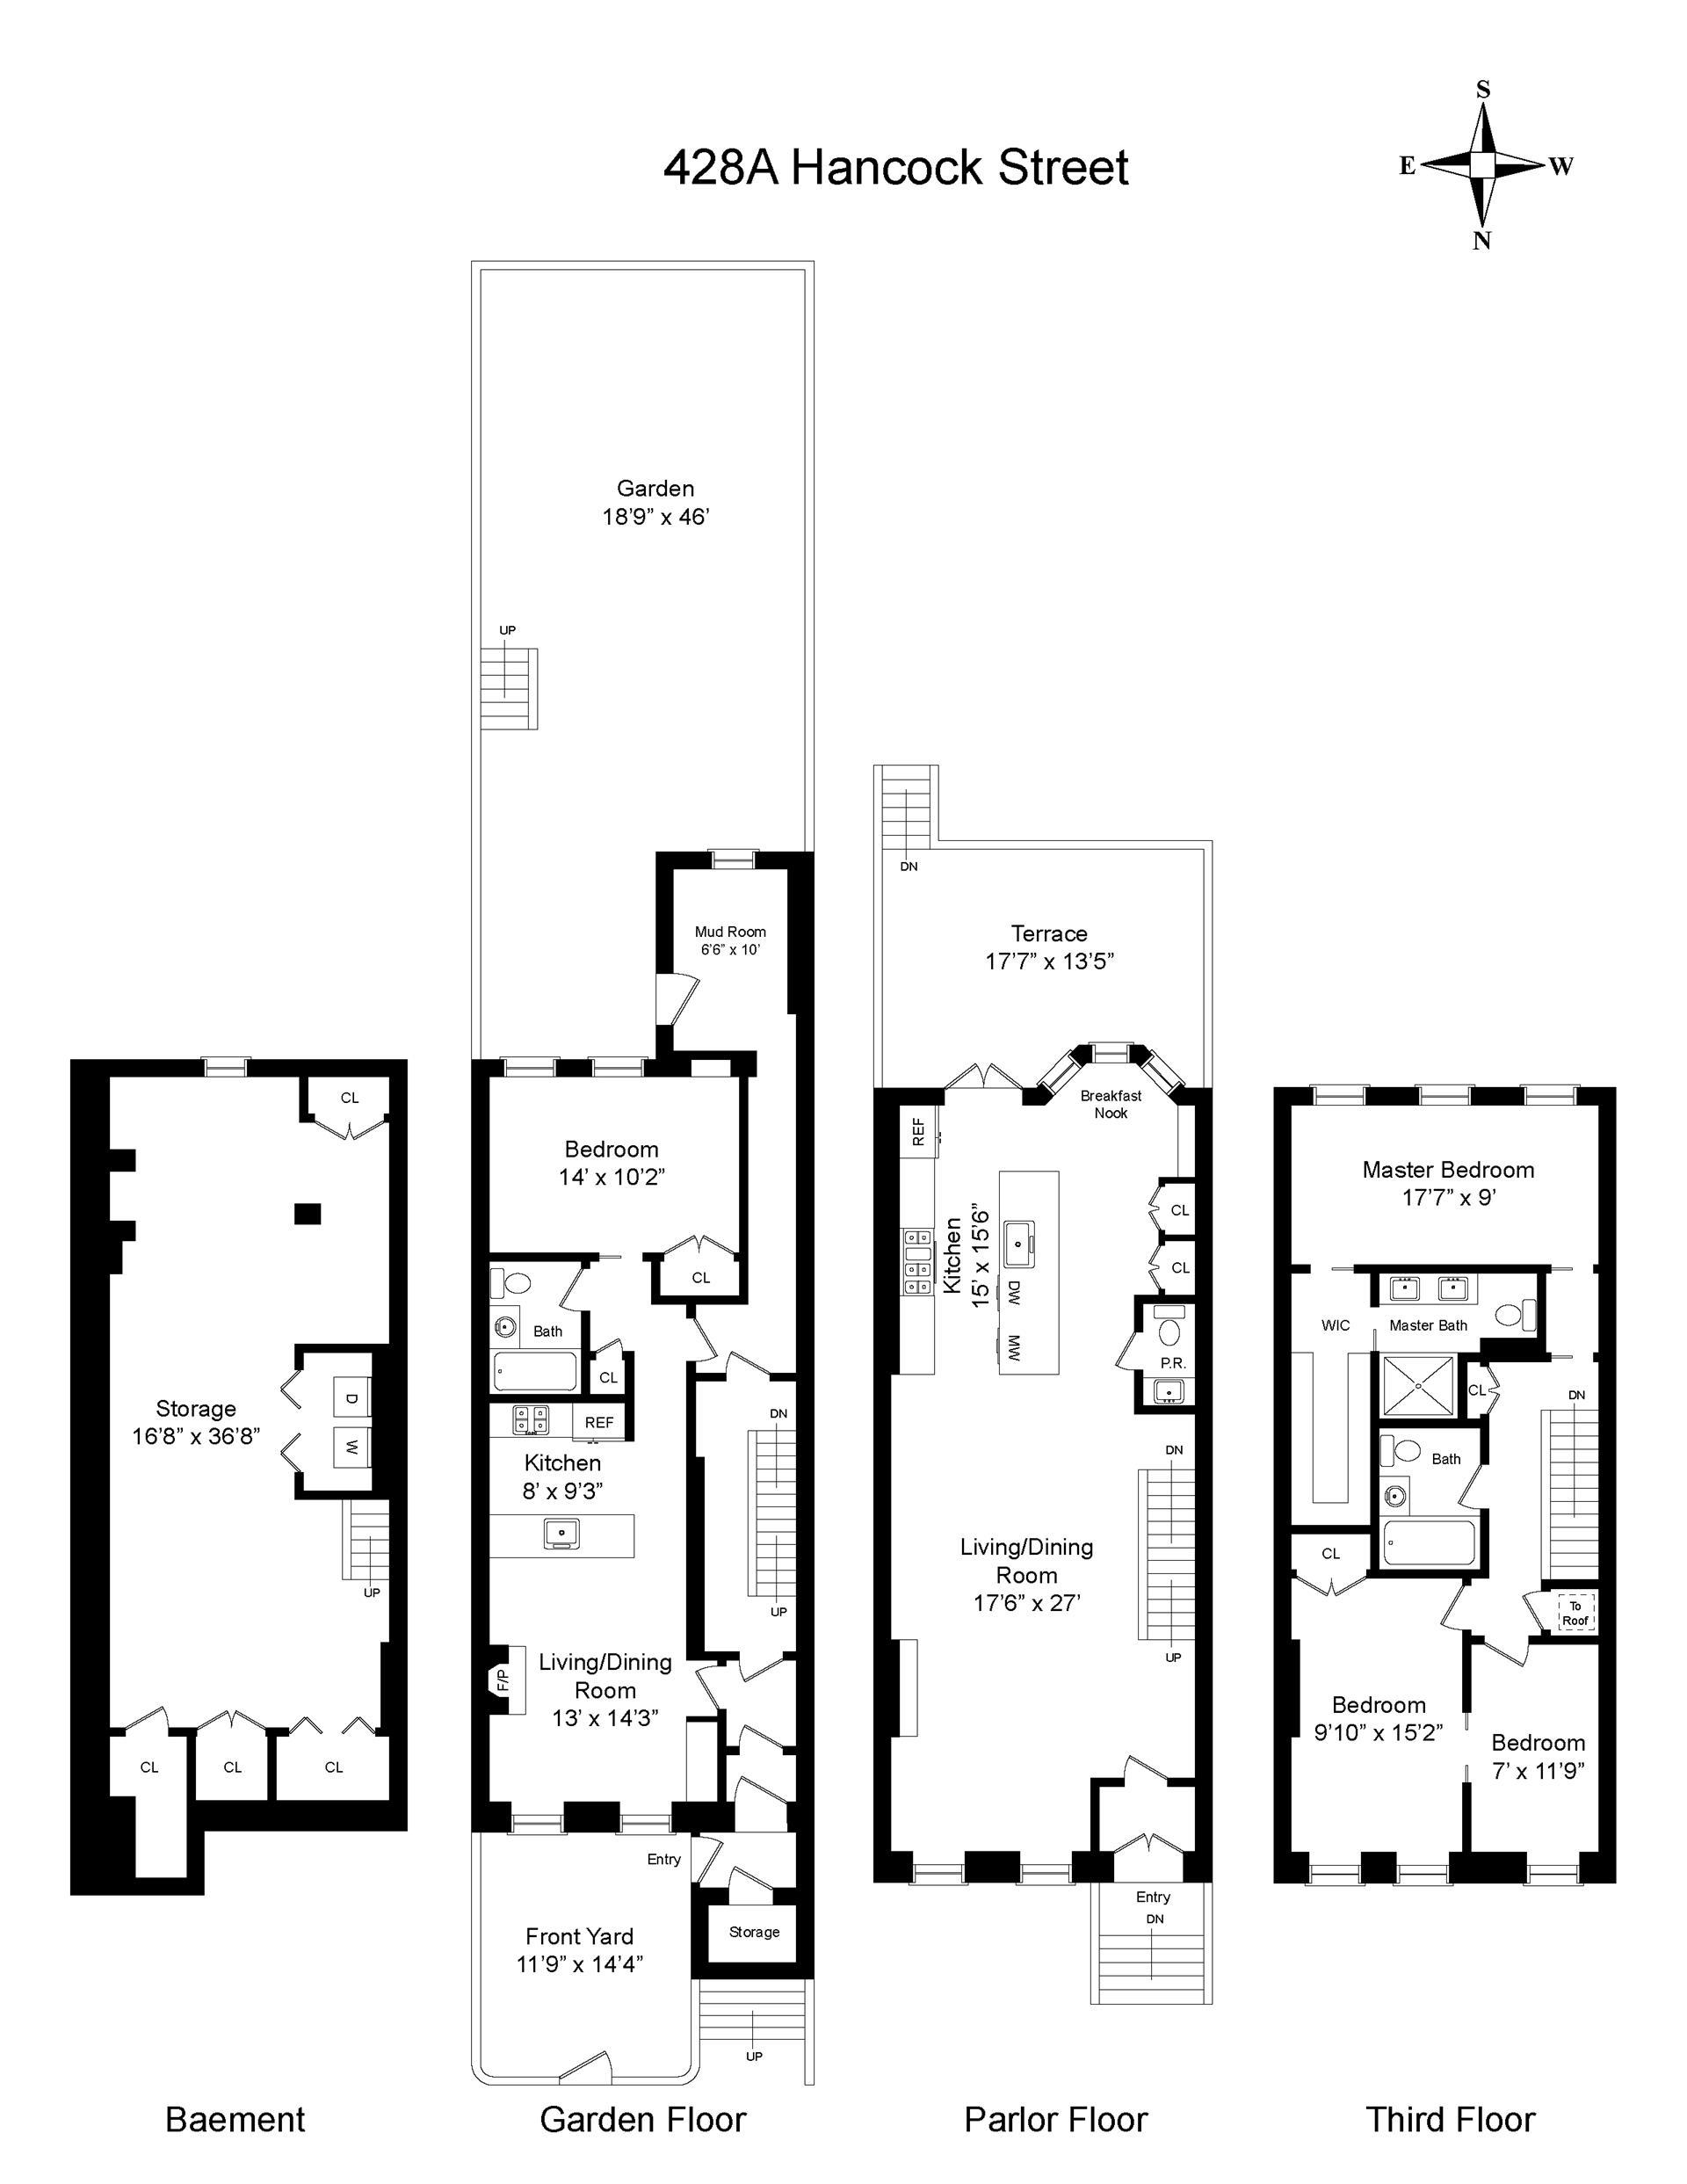 Floor plan of 428A Hancock St - Bedford - Stuyvesant, New York